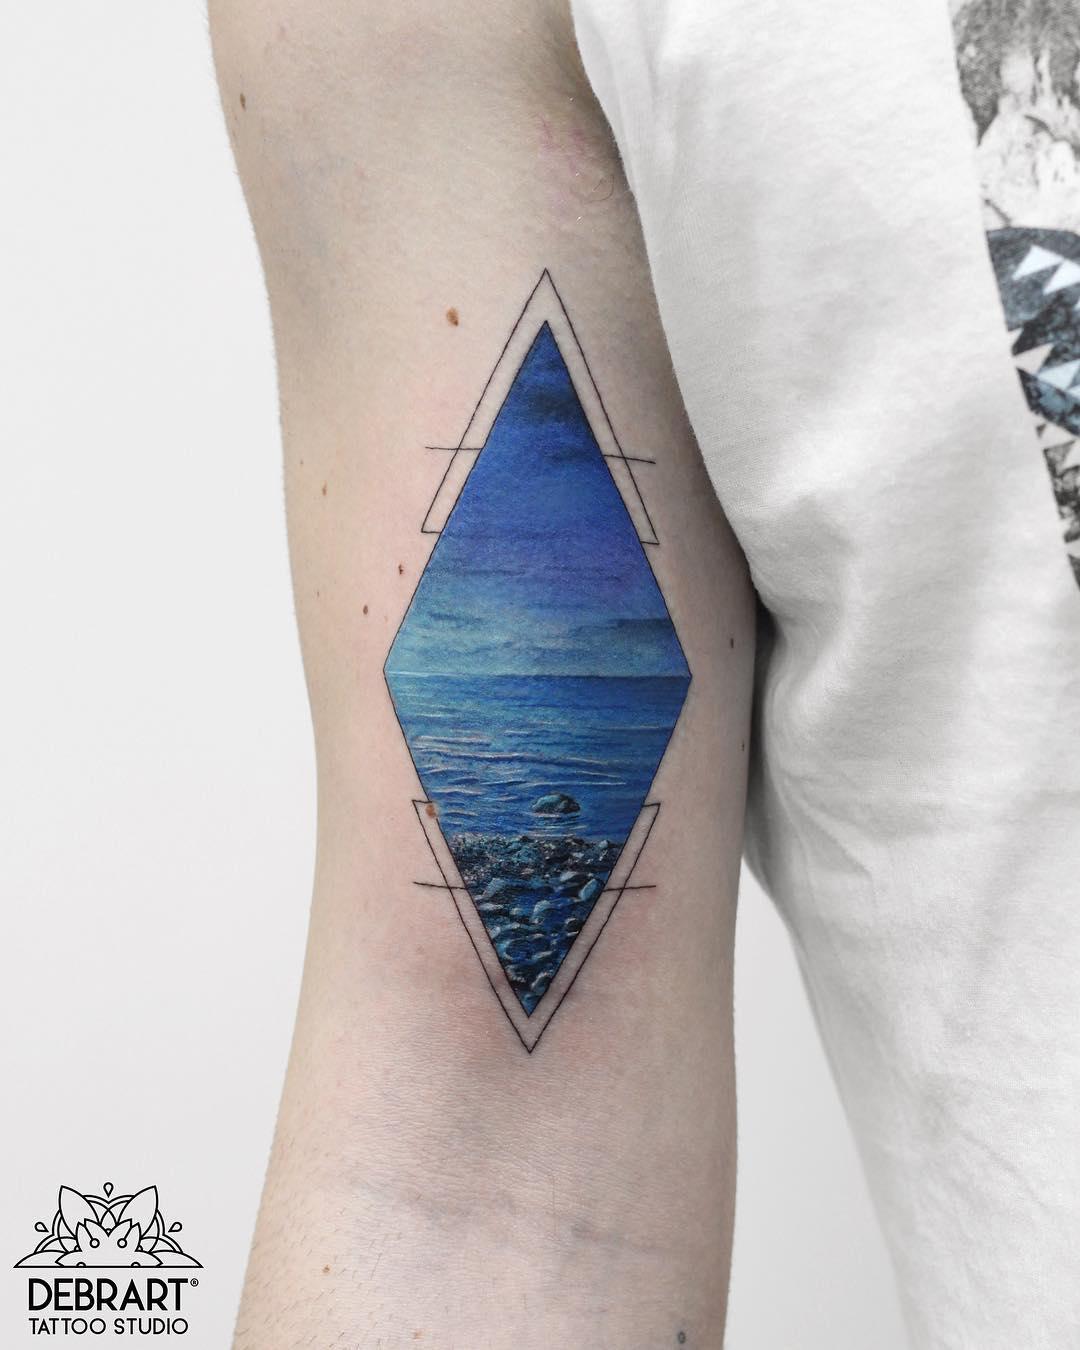 Tattoo - Deborah Genchi, DebrArtist, Debrart Tattoo Studio, Blue.jpg